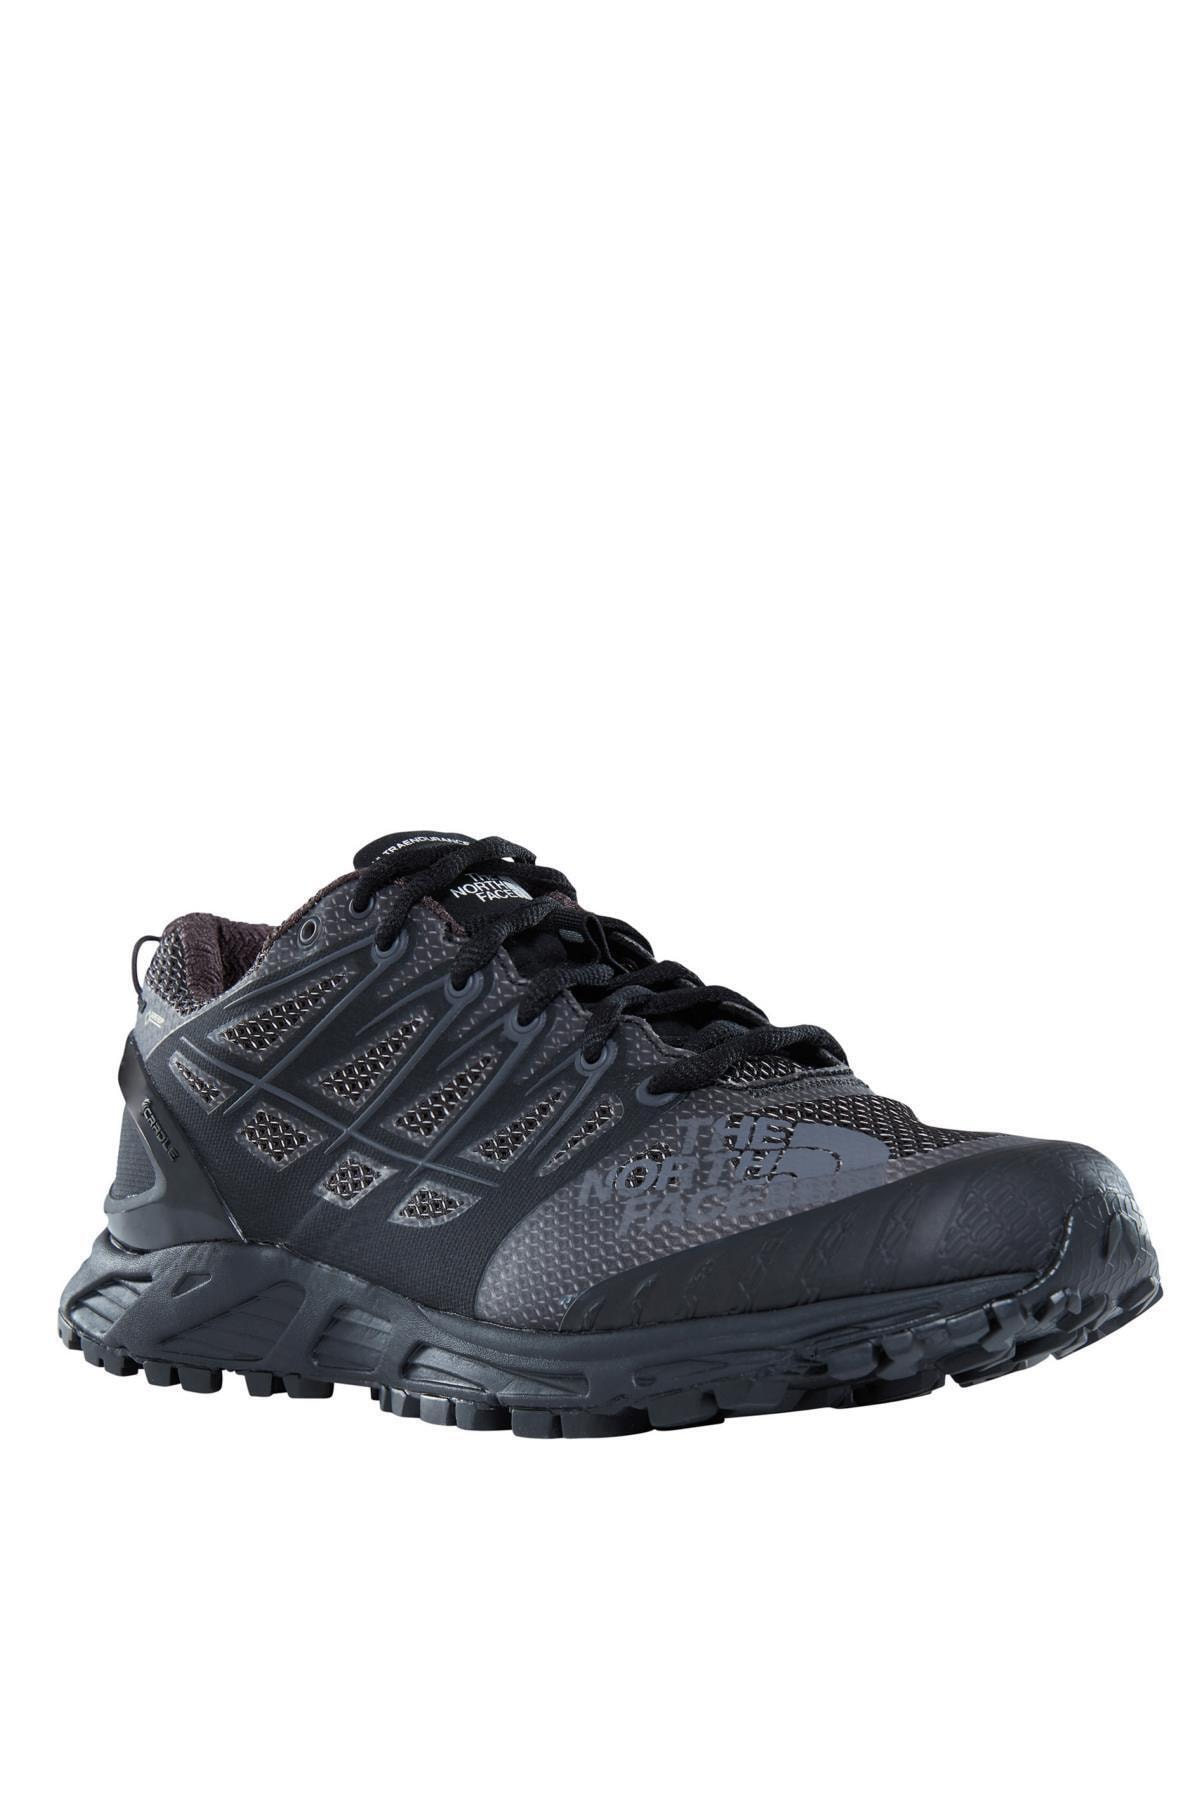 THE NORTH FACE Ultra Endurance 2 Gtx Kadın Ayakkabı Siyah 1